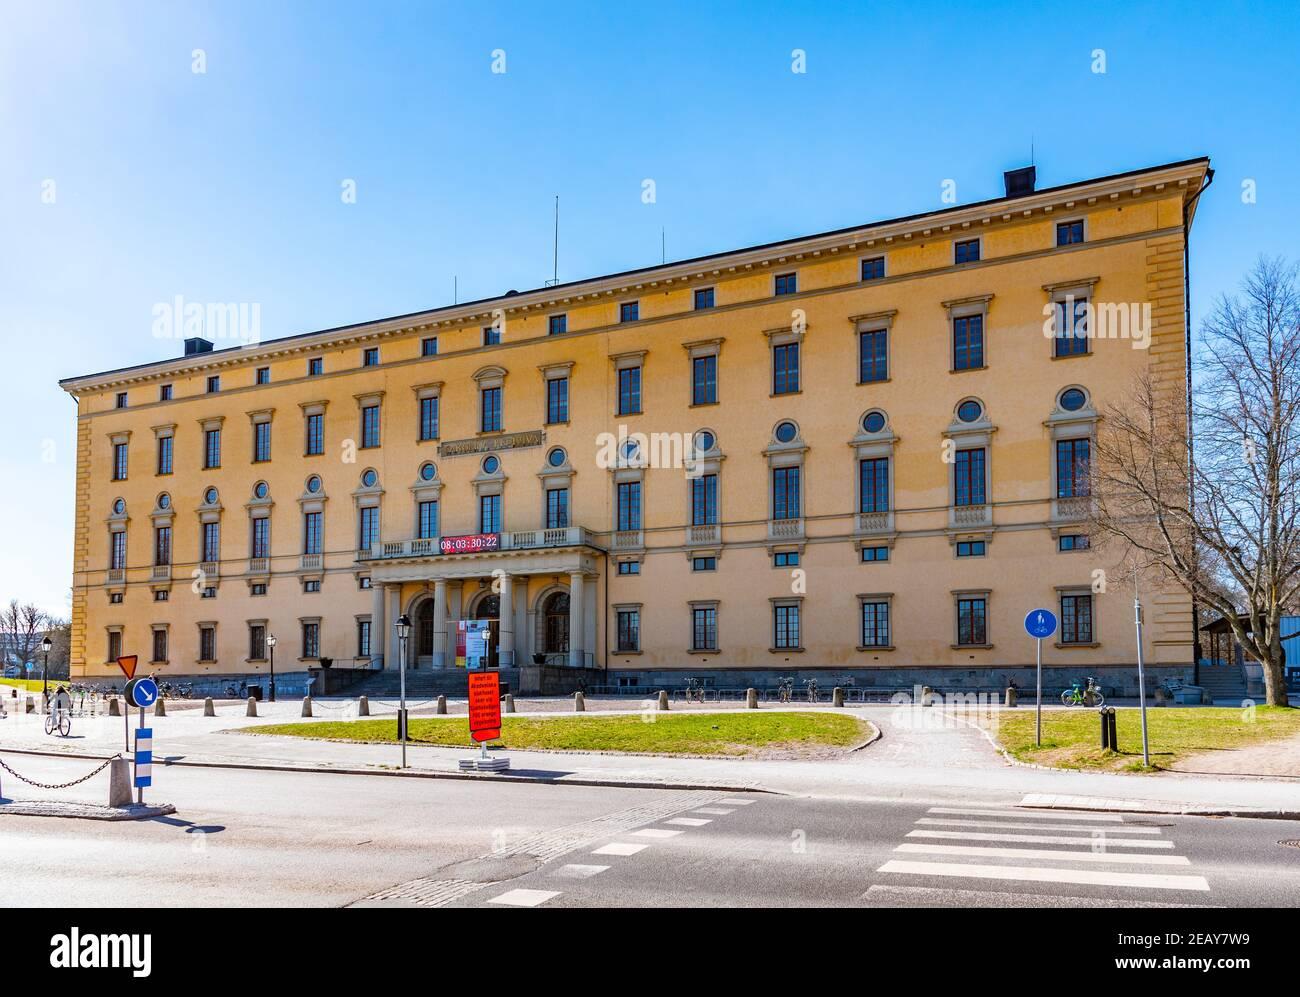 UPPSALA, SWEDEN, APRIL 22, 2019: Uppsala university library in Sweden Stock Photo